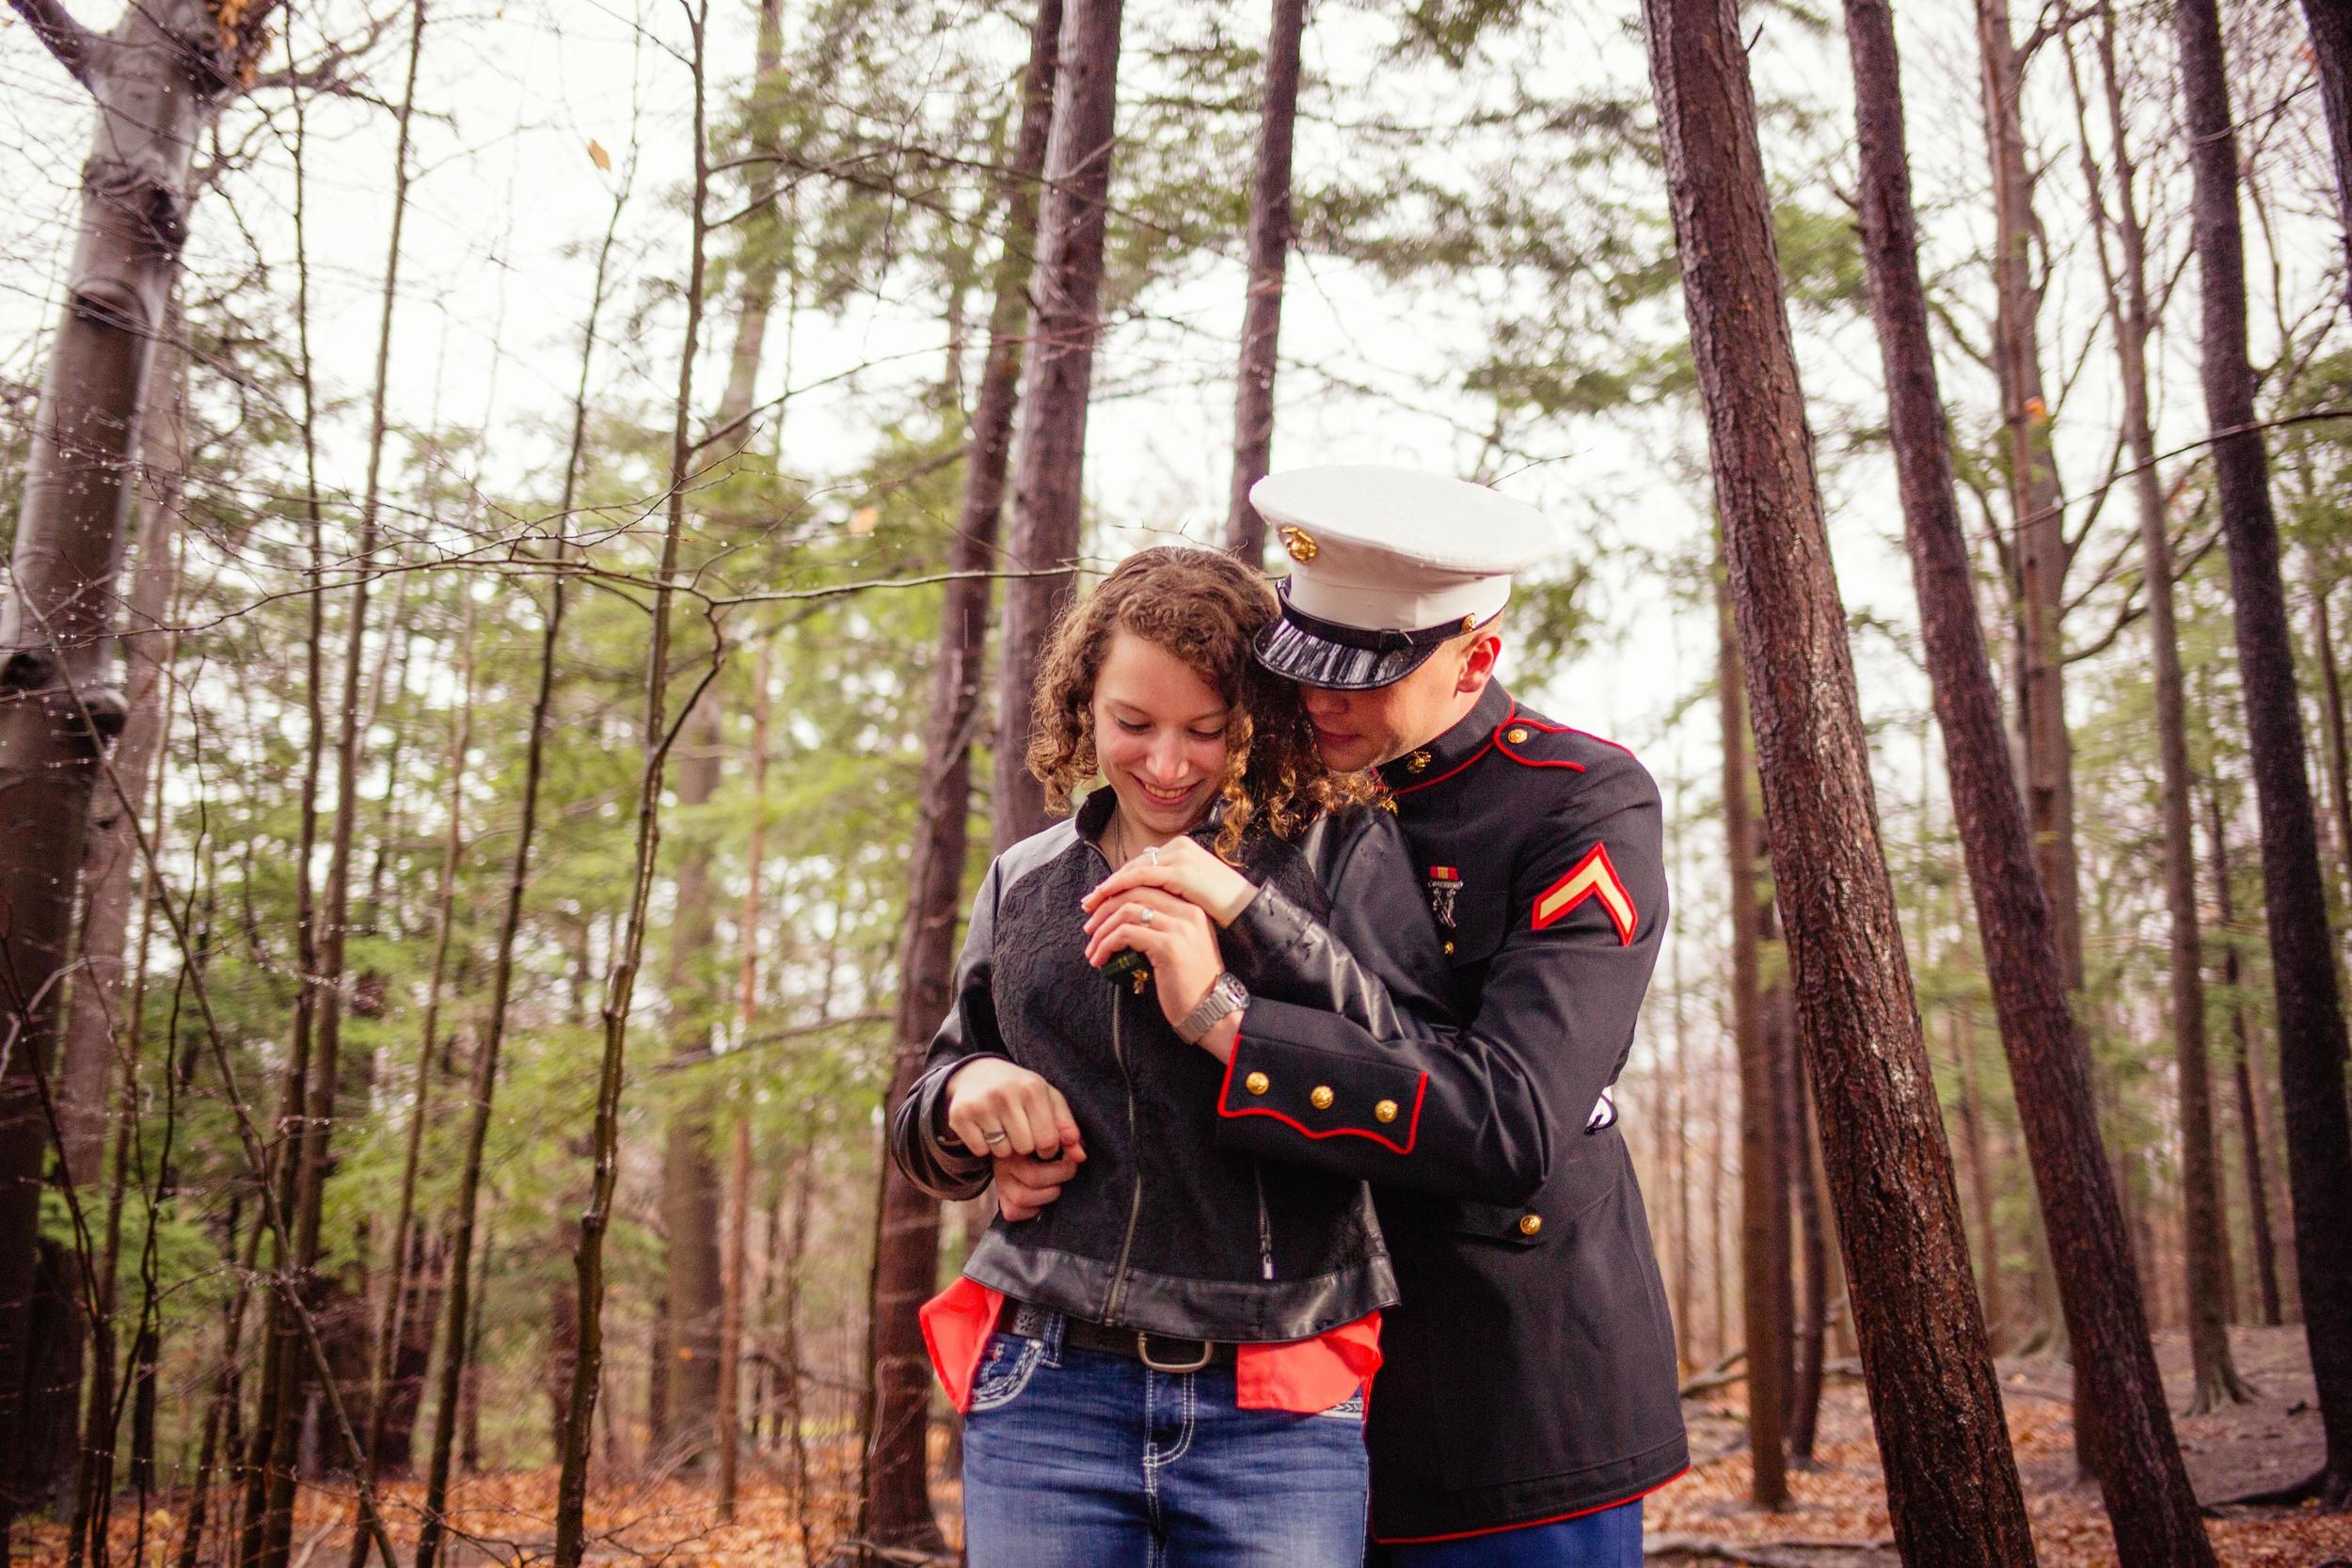 Megan-Brandon-Engagement-Stefan-Ludwig-Photography-Buffalo-NY-Chestnut-Ridge-Park-44-x.jpg